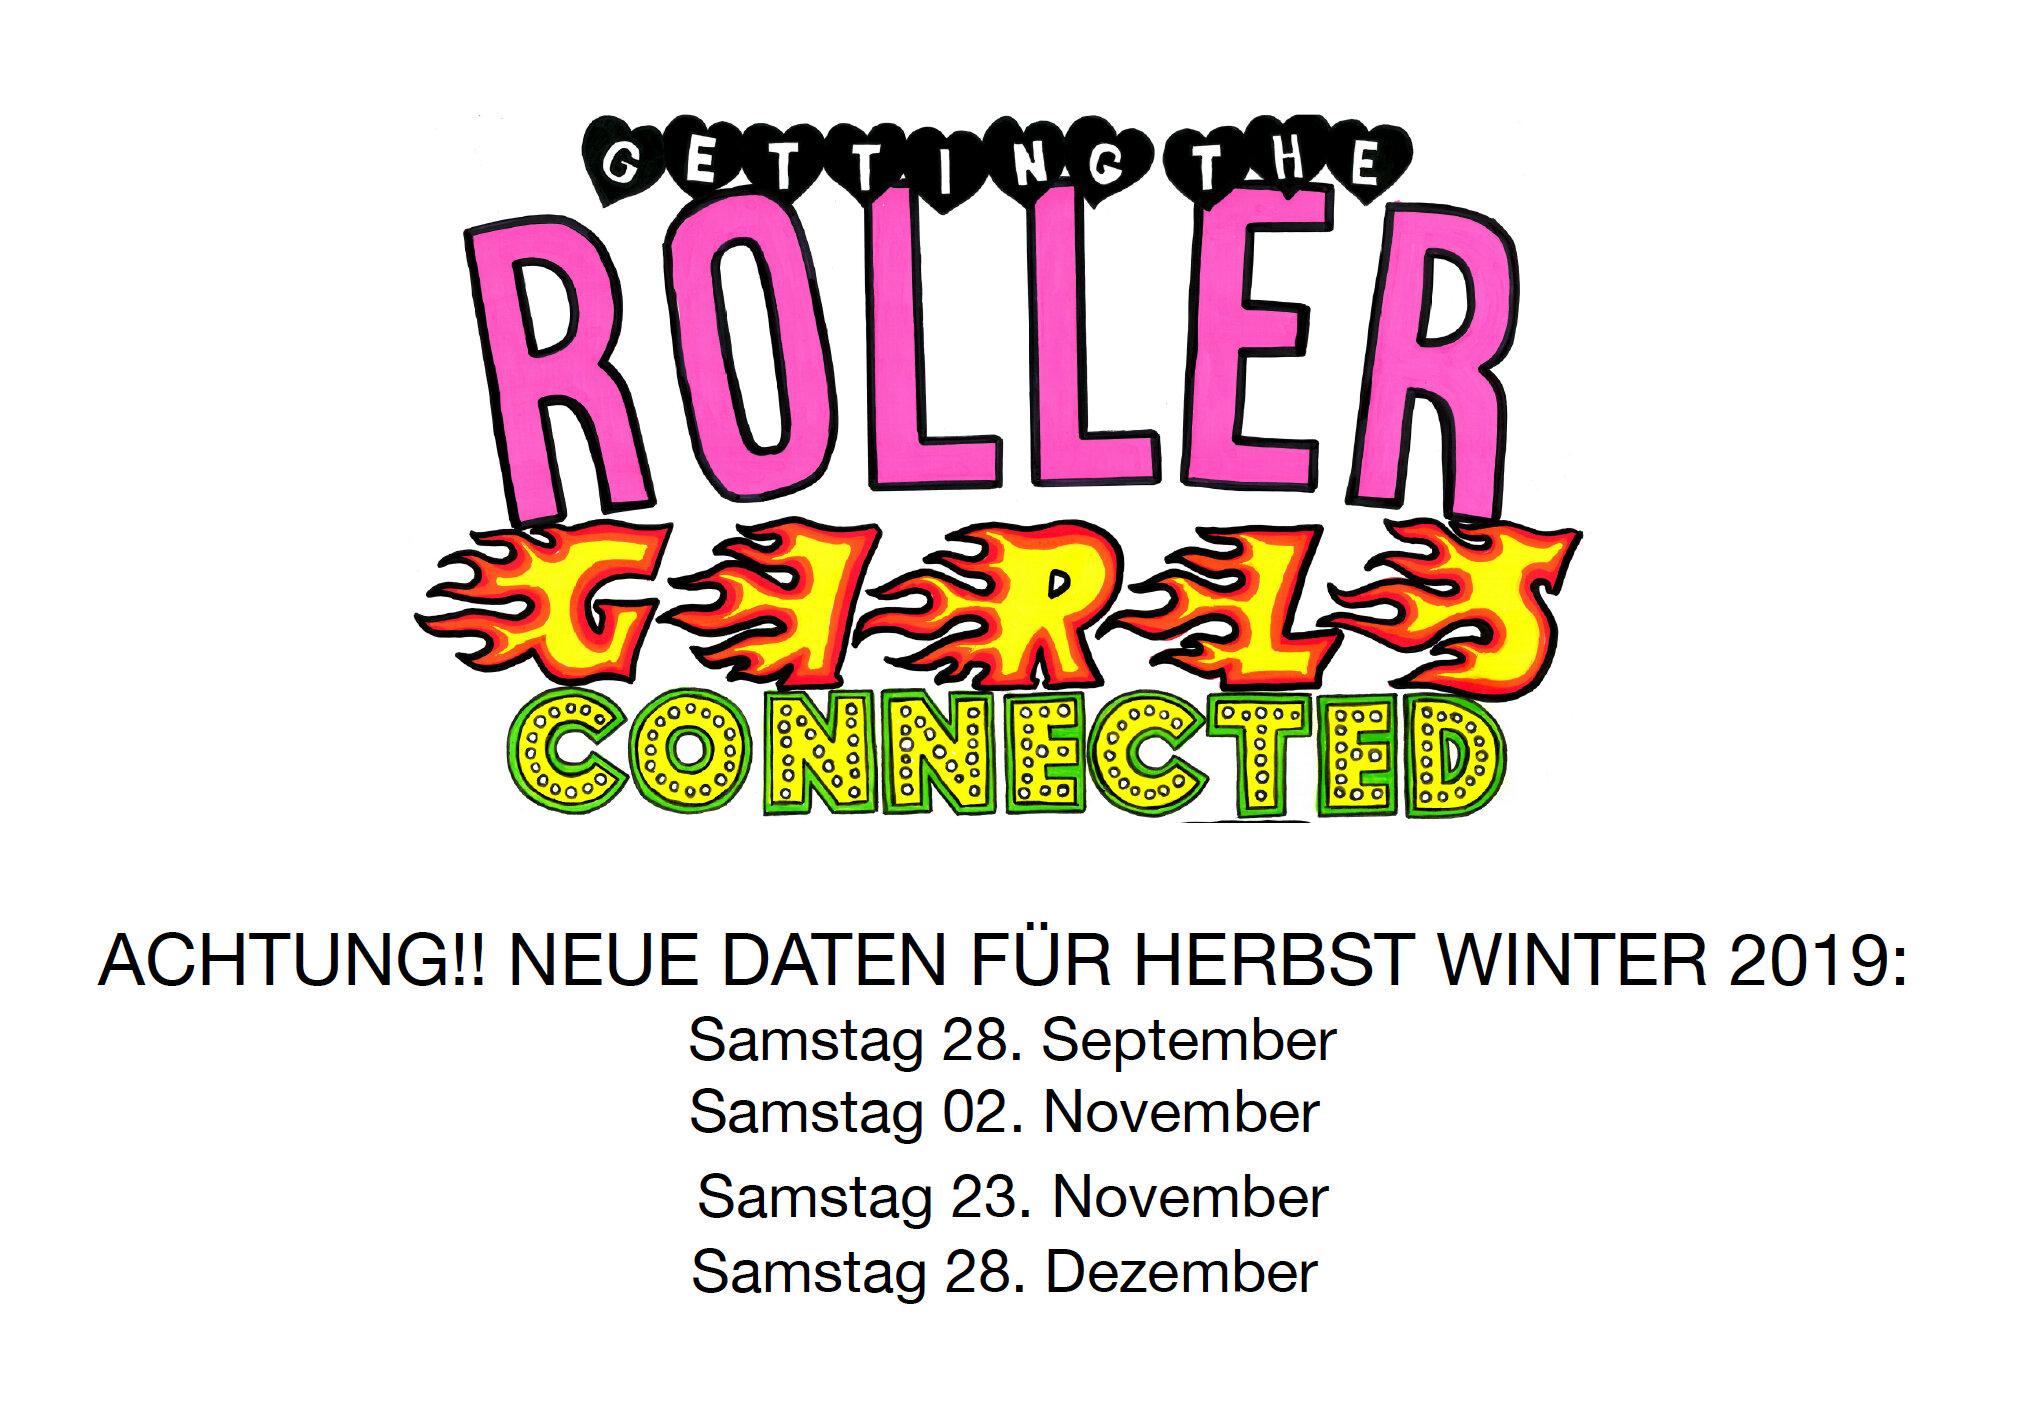 Roller Girlz Neue Daten.jpg